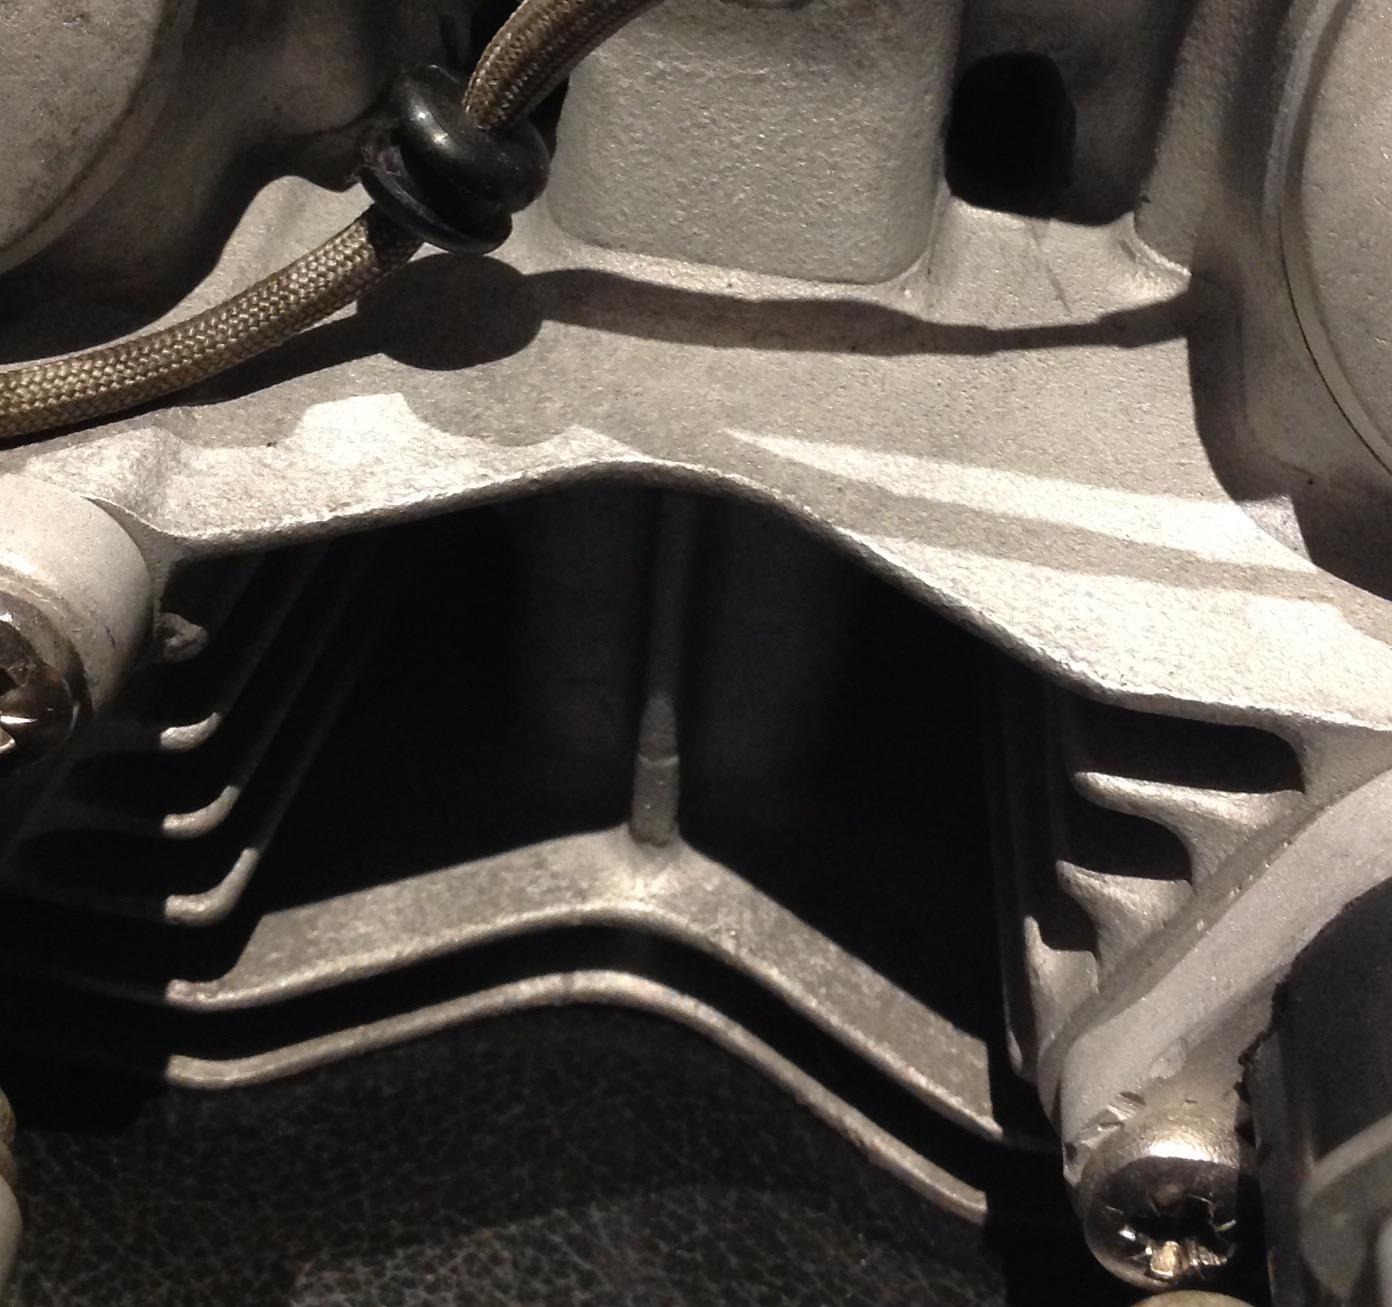 CB200 Cam Chain adjustment bolt misplaced!?-img_7022.jpg